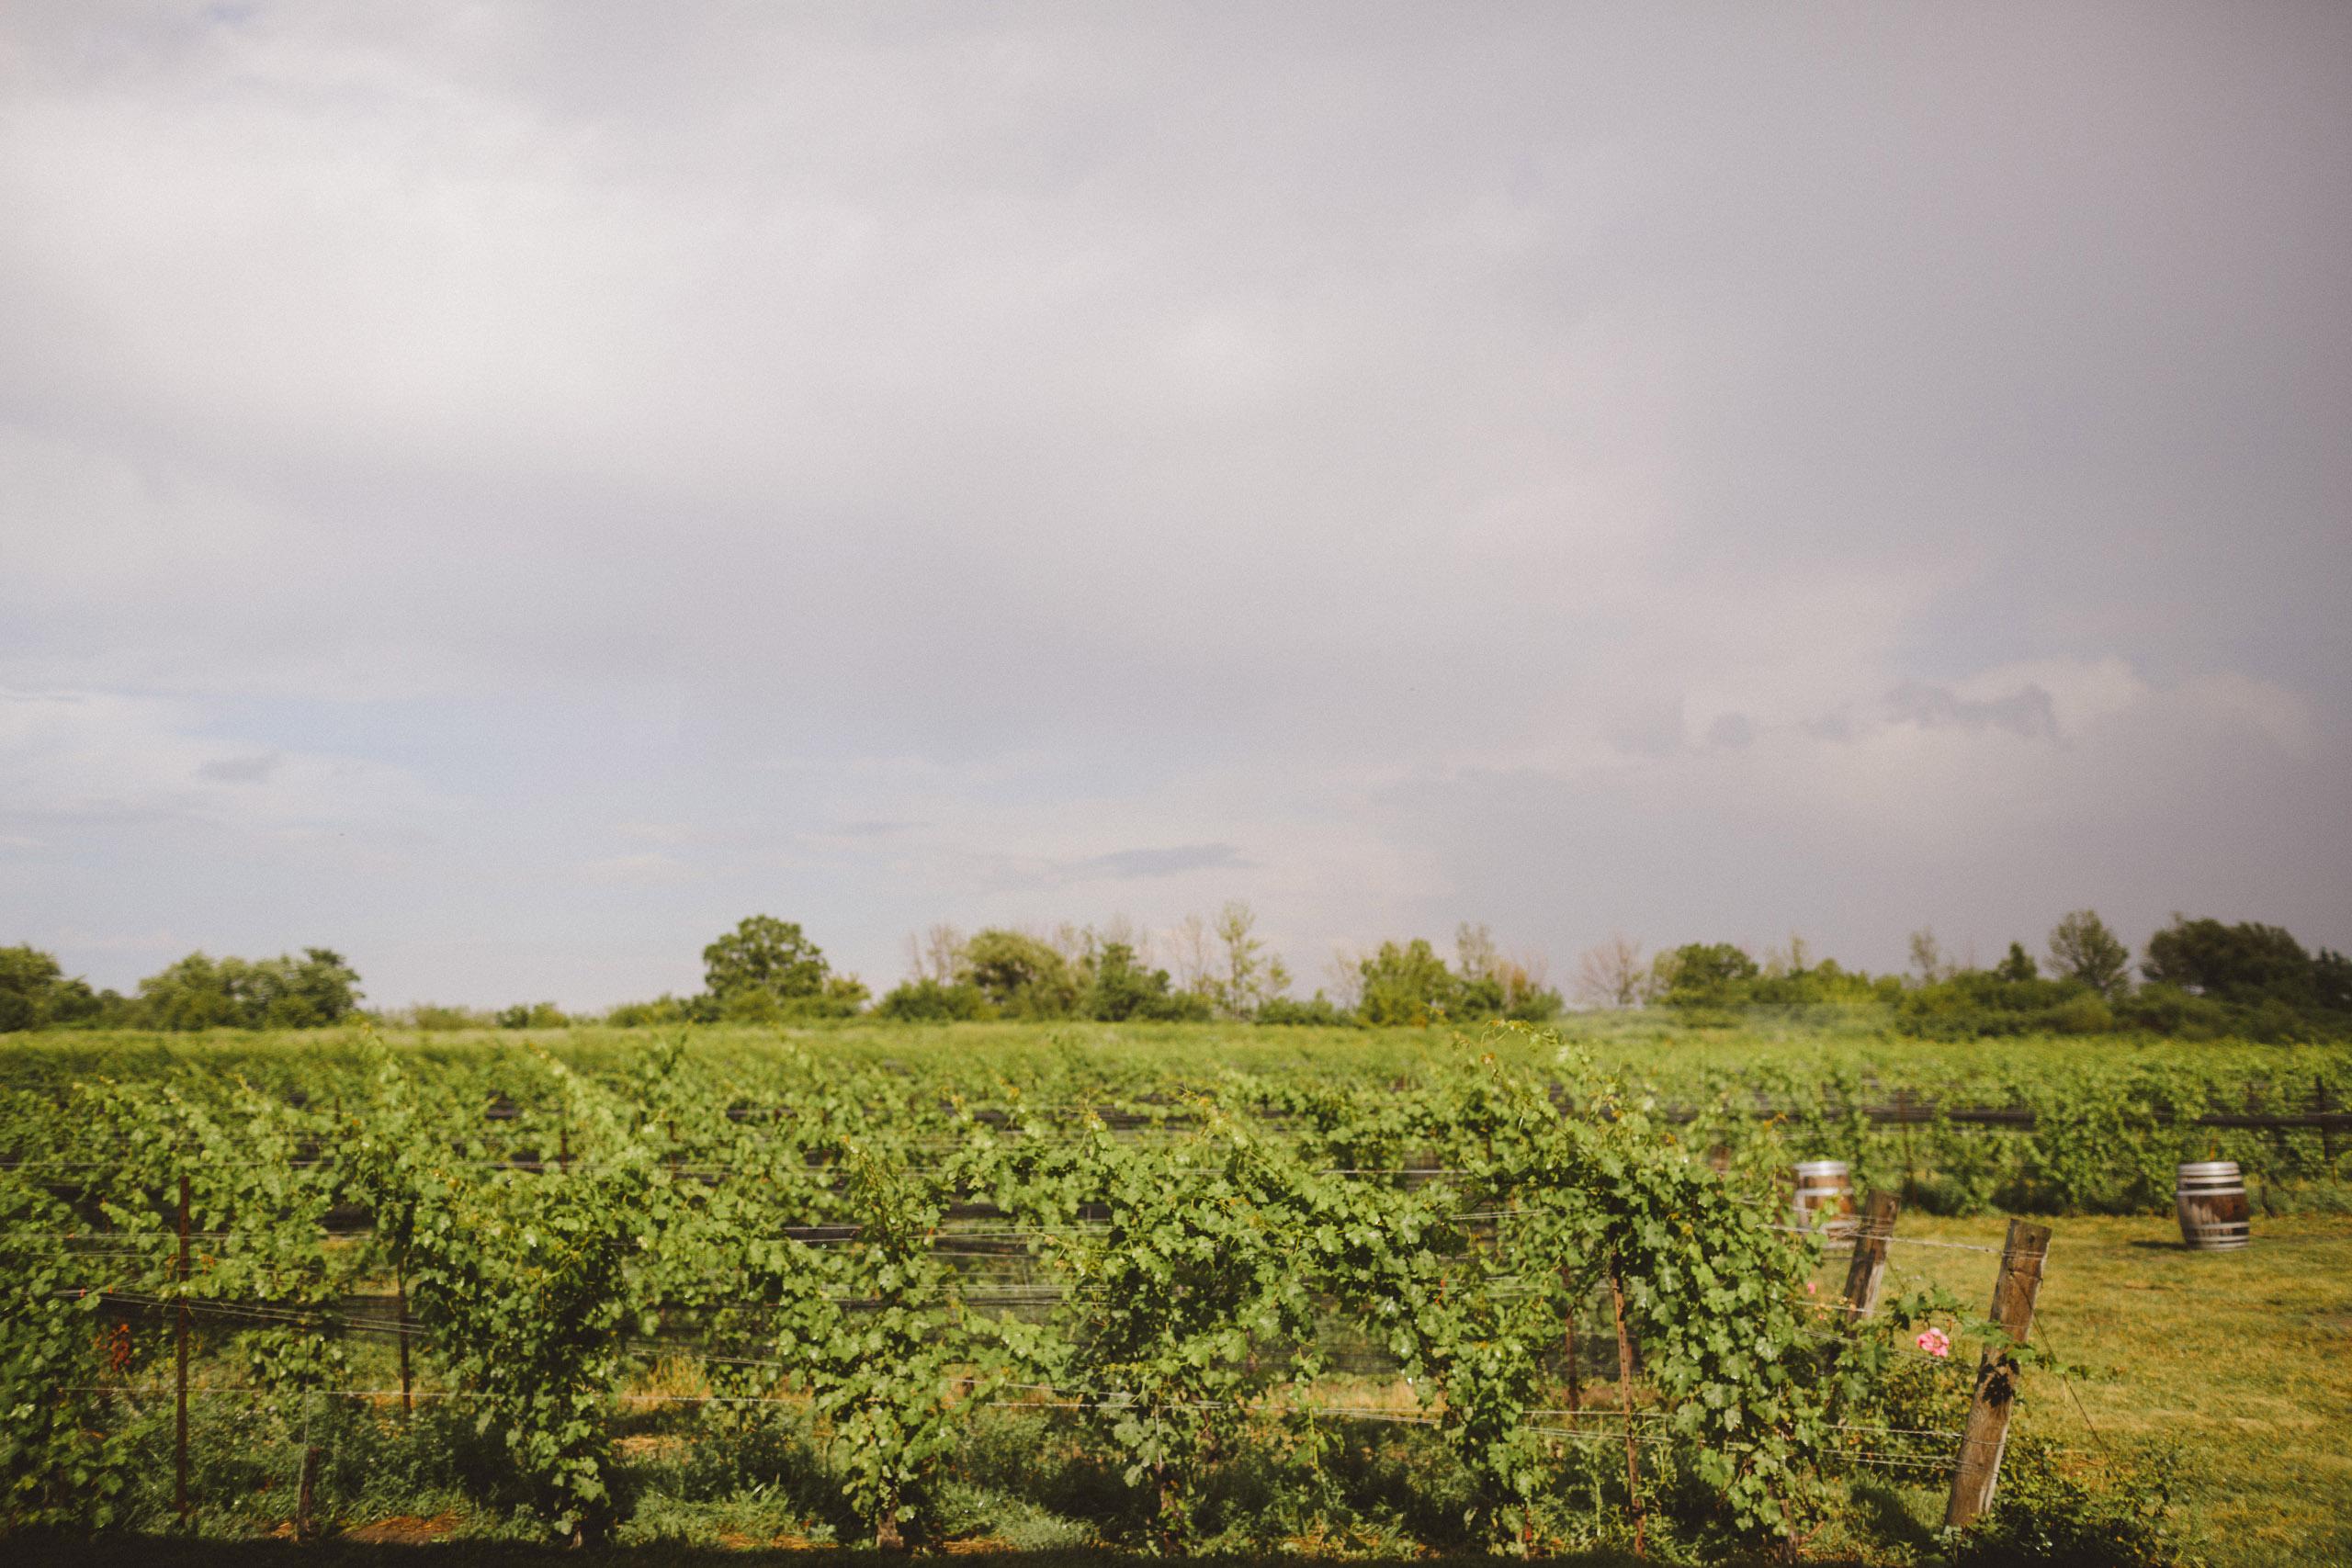 southbook vineyard grapes field sunset